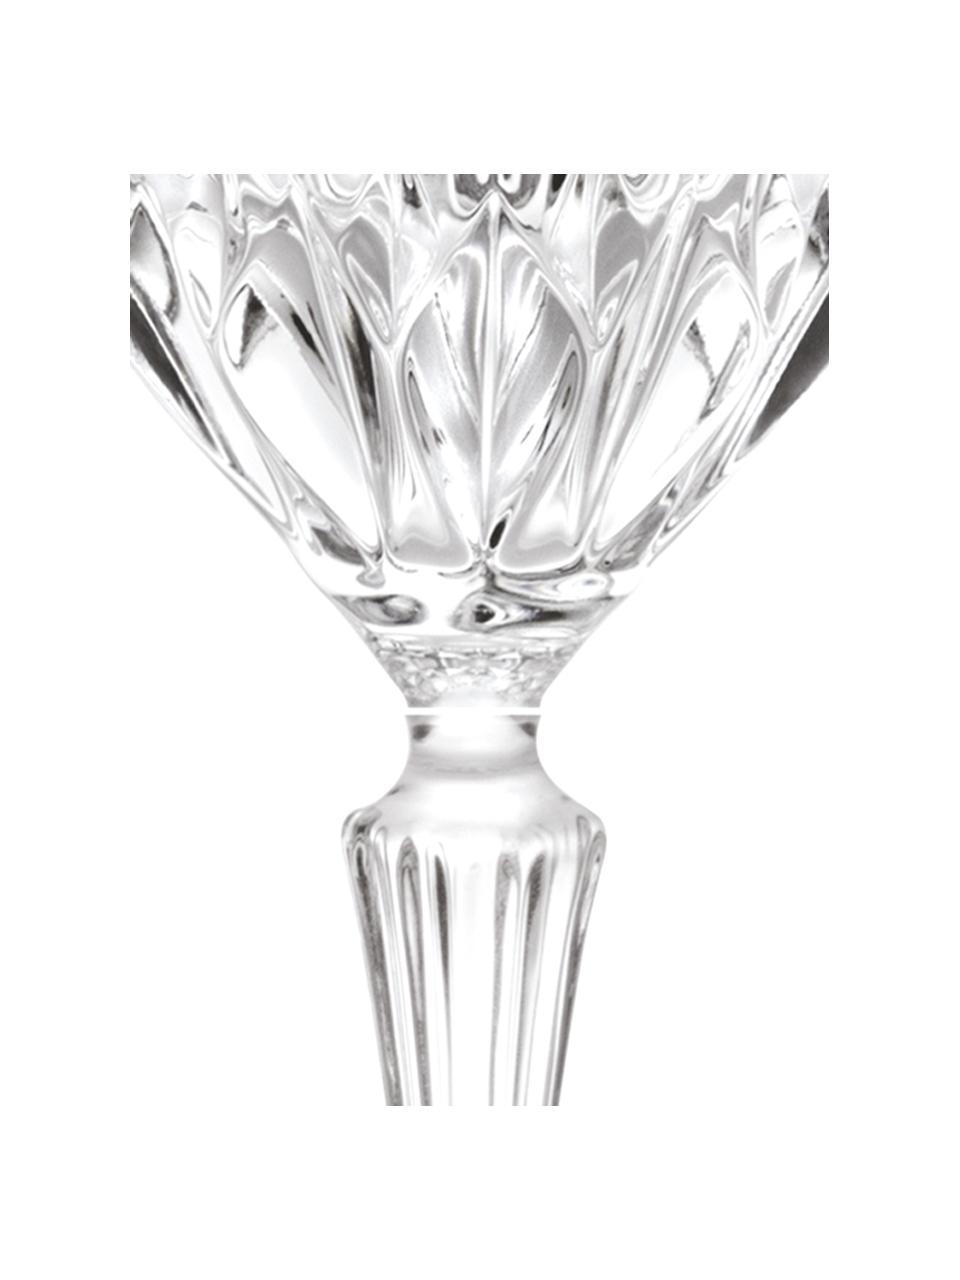 Copas de vino de cristal Adagio 6uds., Cristal, Transparente, Ø 9 x Al 21 cm